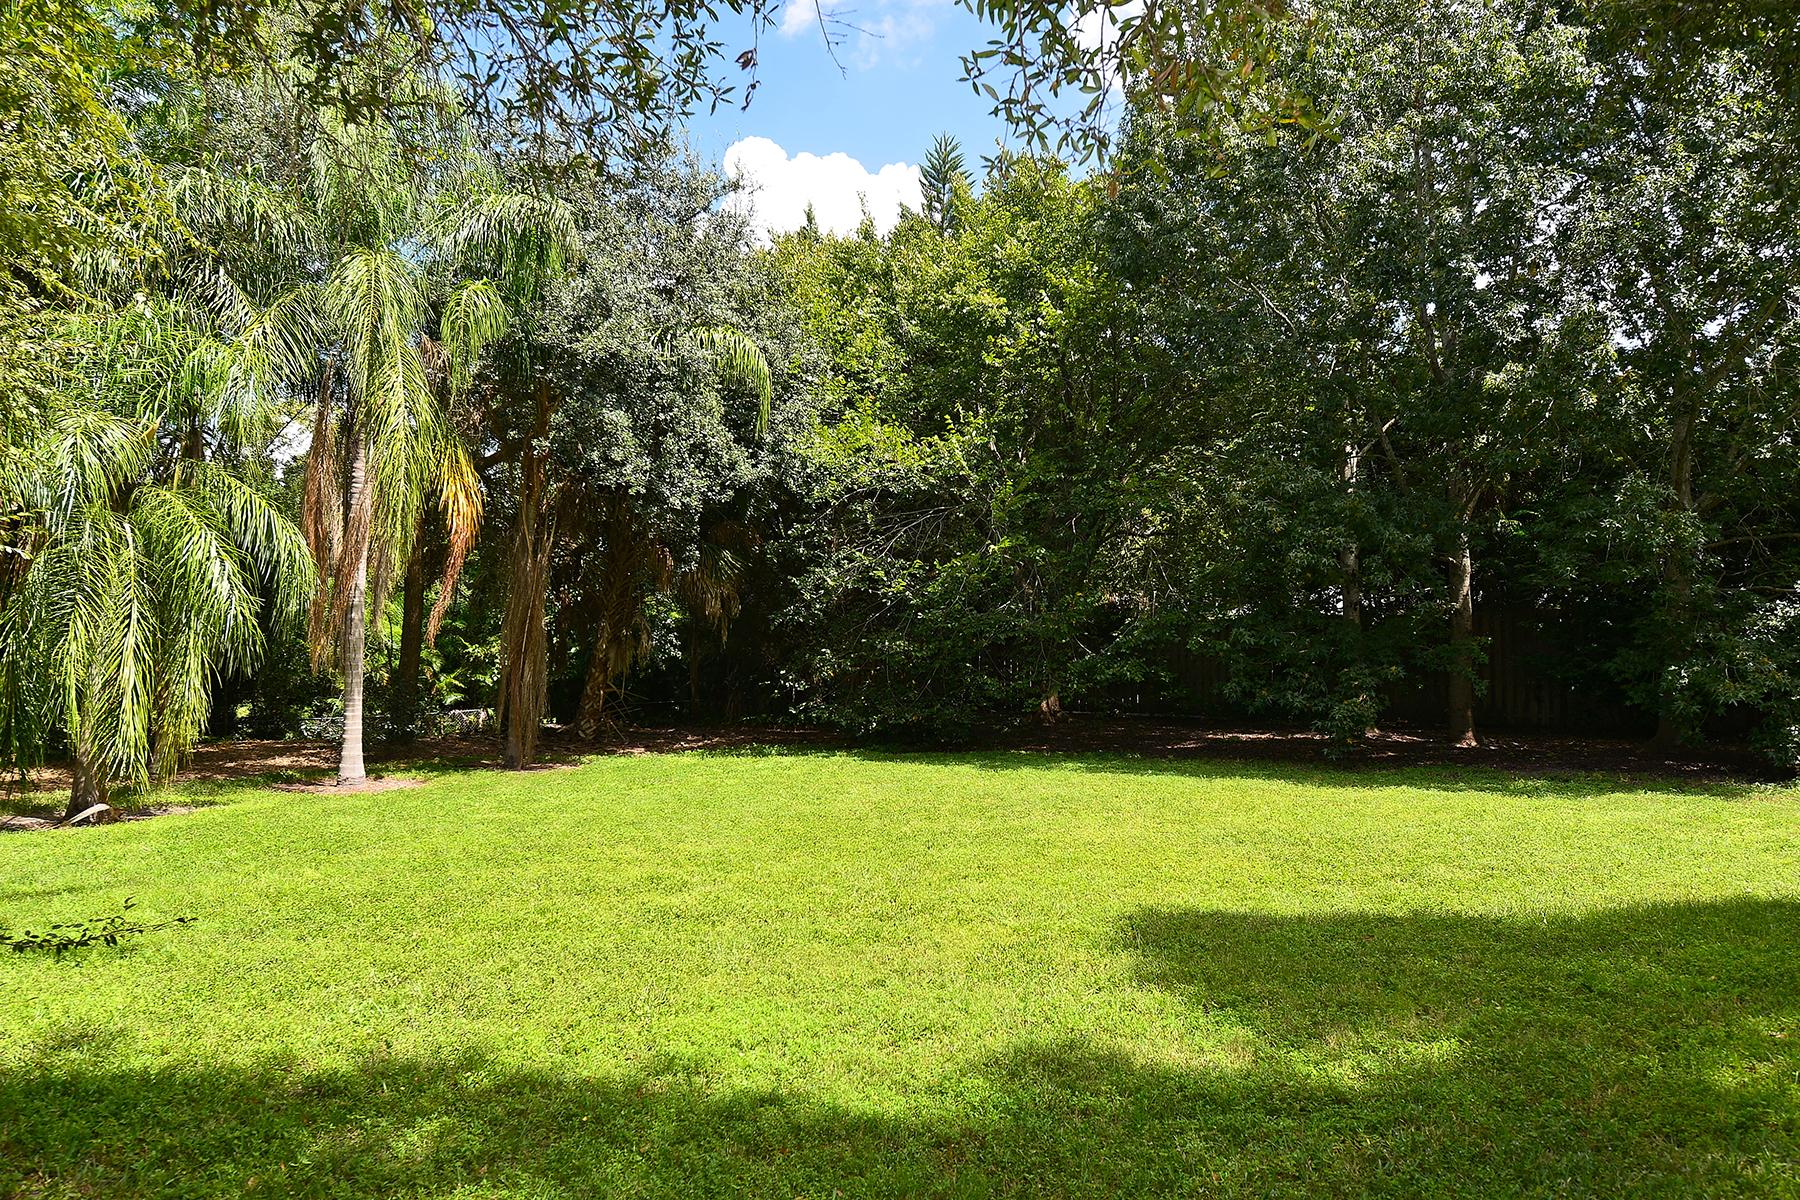 Terreno para Venda às FIELD CLUB Ivanhoe St 0 Sarasota, Florida, 34231 Estados Unidos